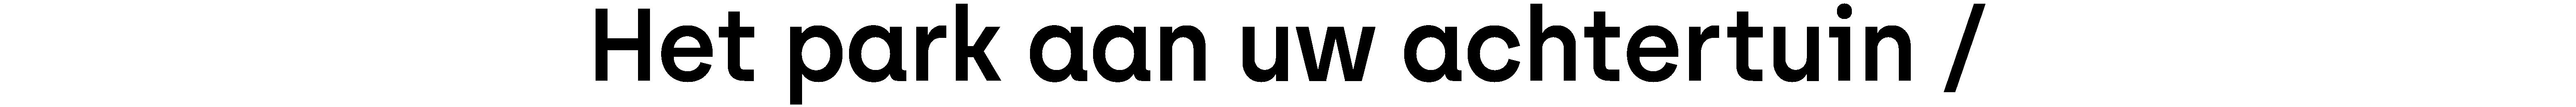 c8a5f300-1d19-11eb-b2a6-3defc51f7ad2.png